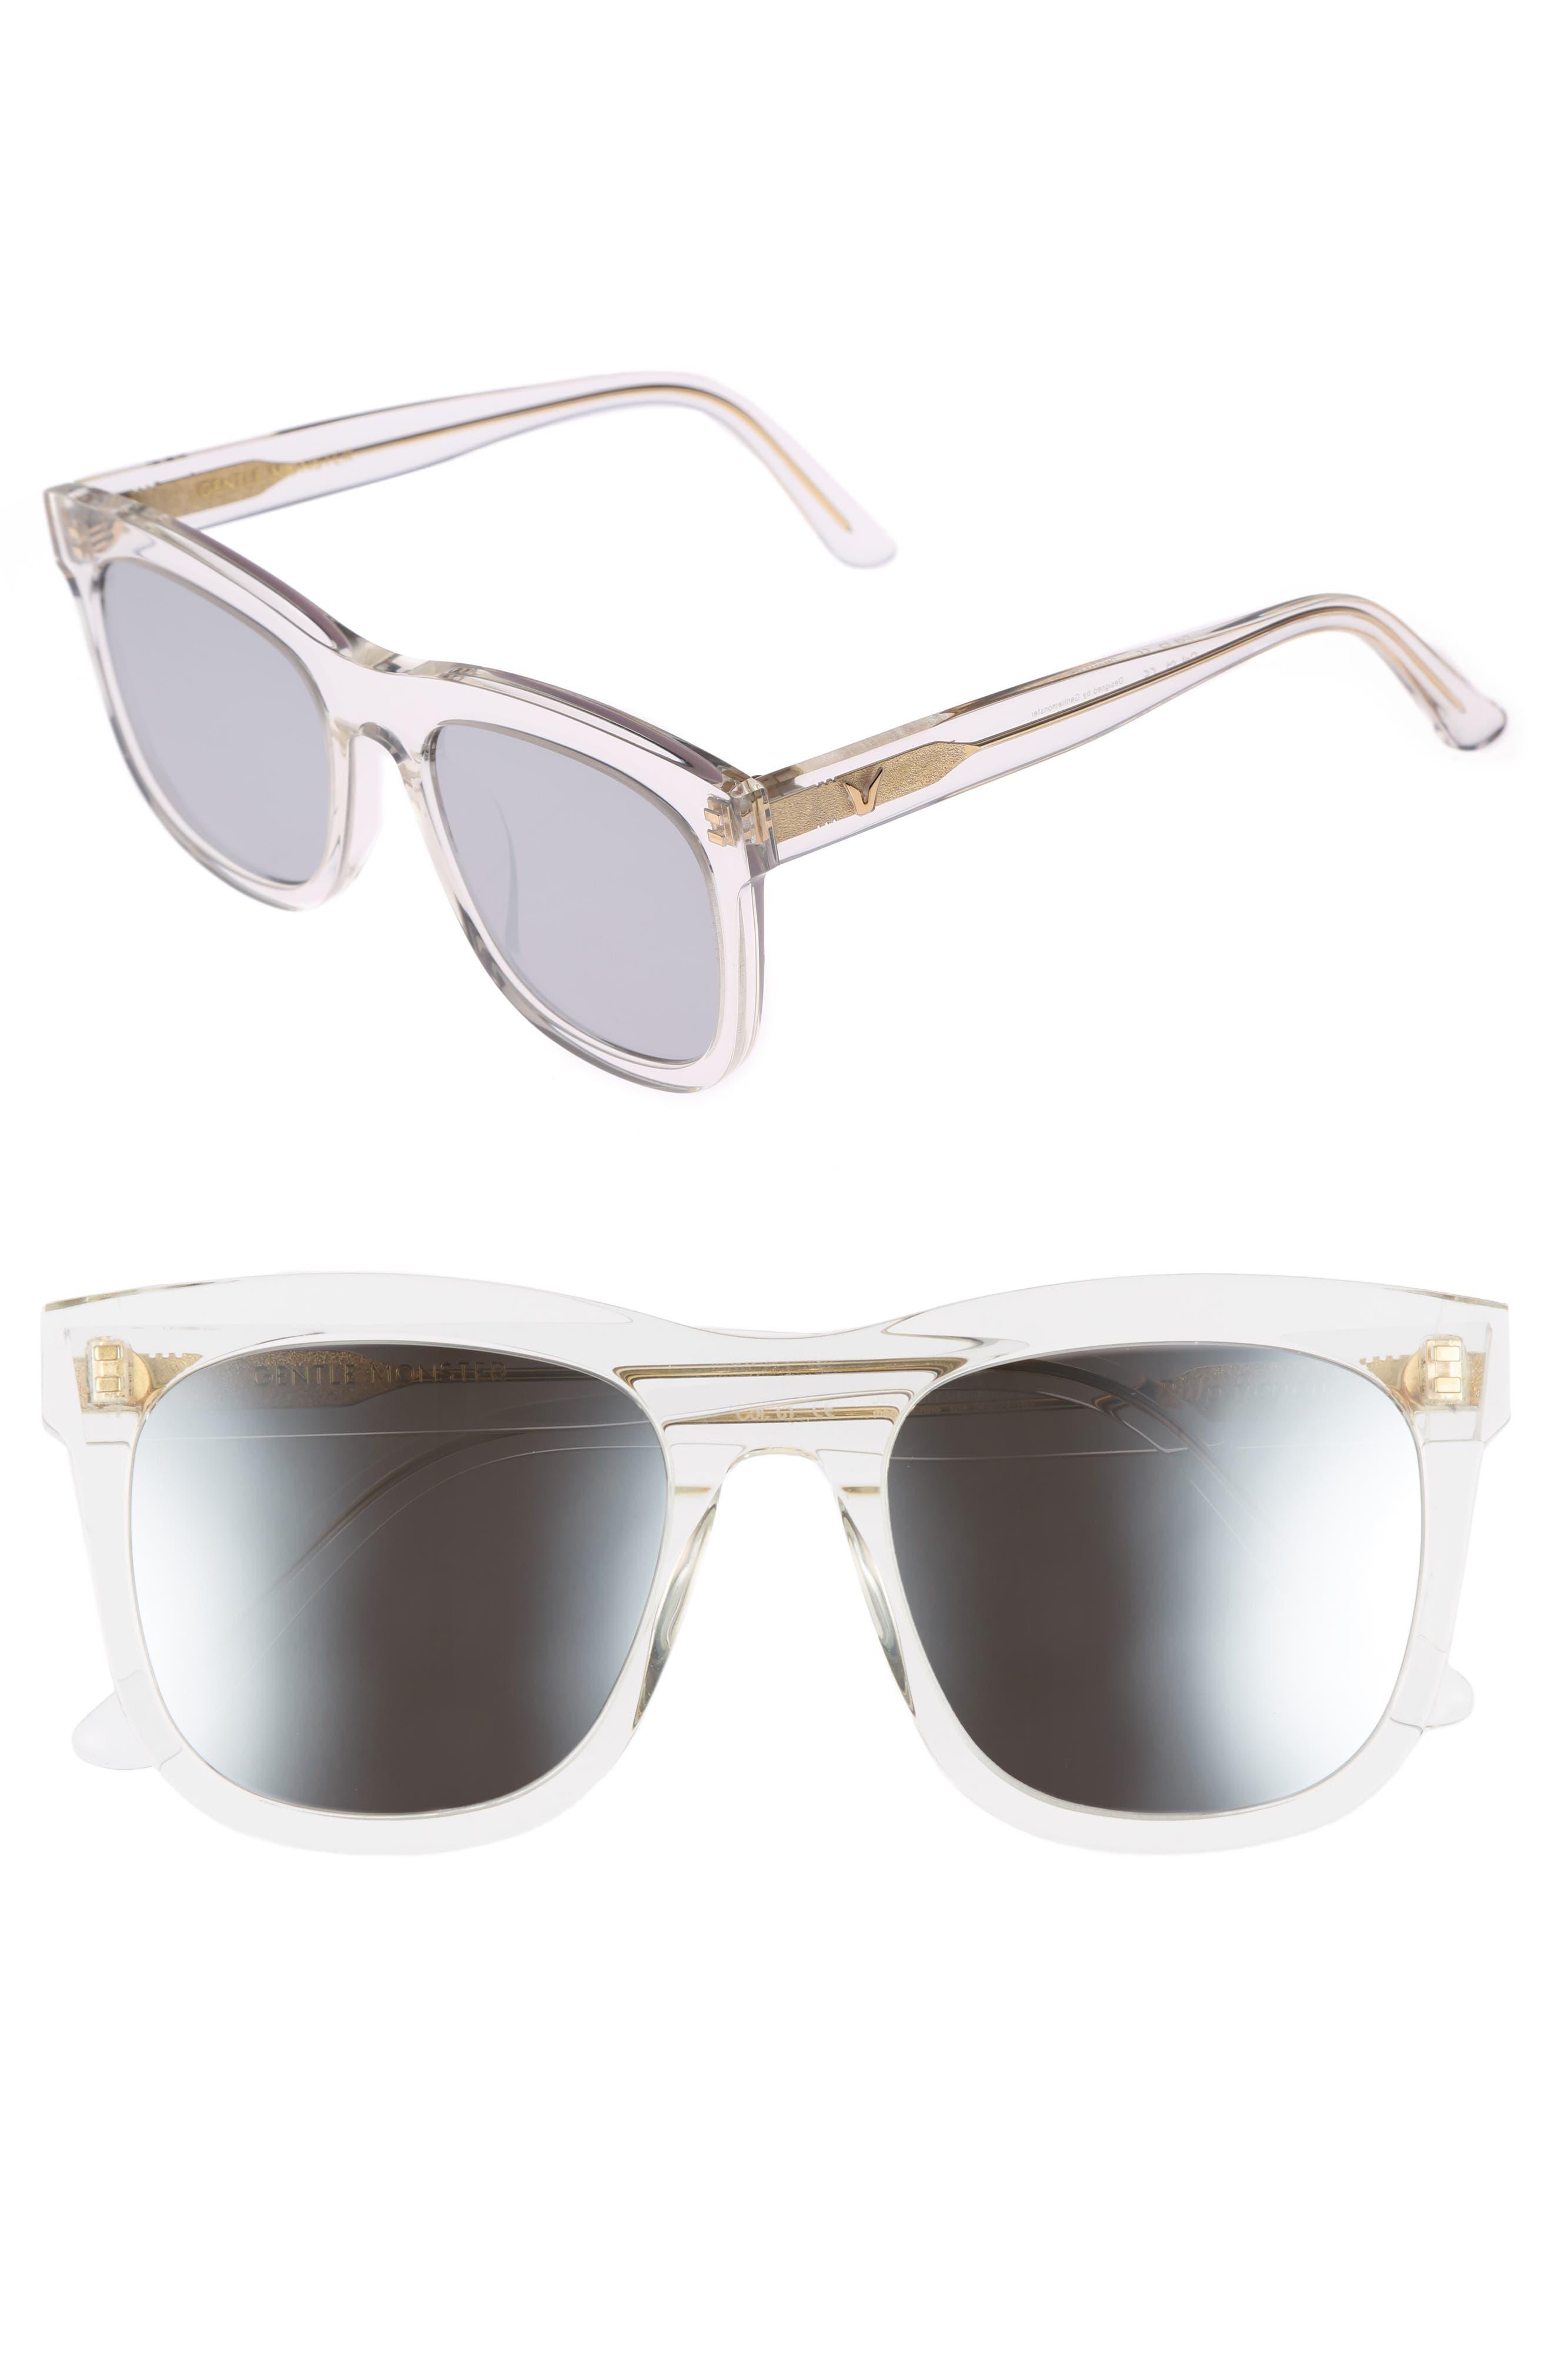 Pulp Fiction 54mm Sunglasses,                         Main,                         color, Clear Mirror